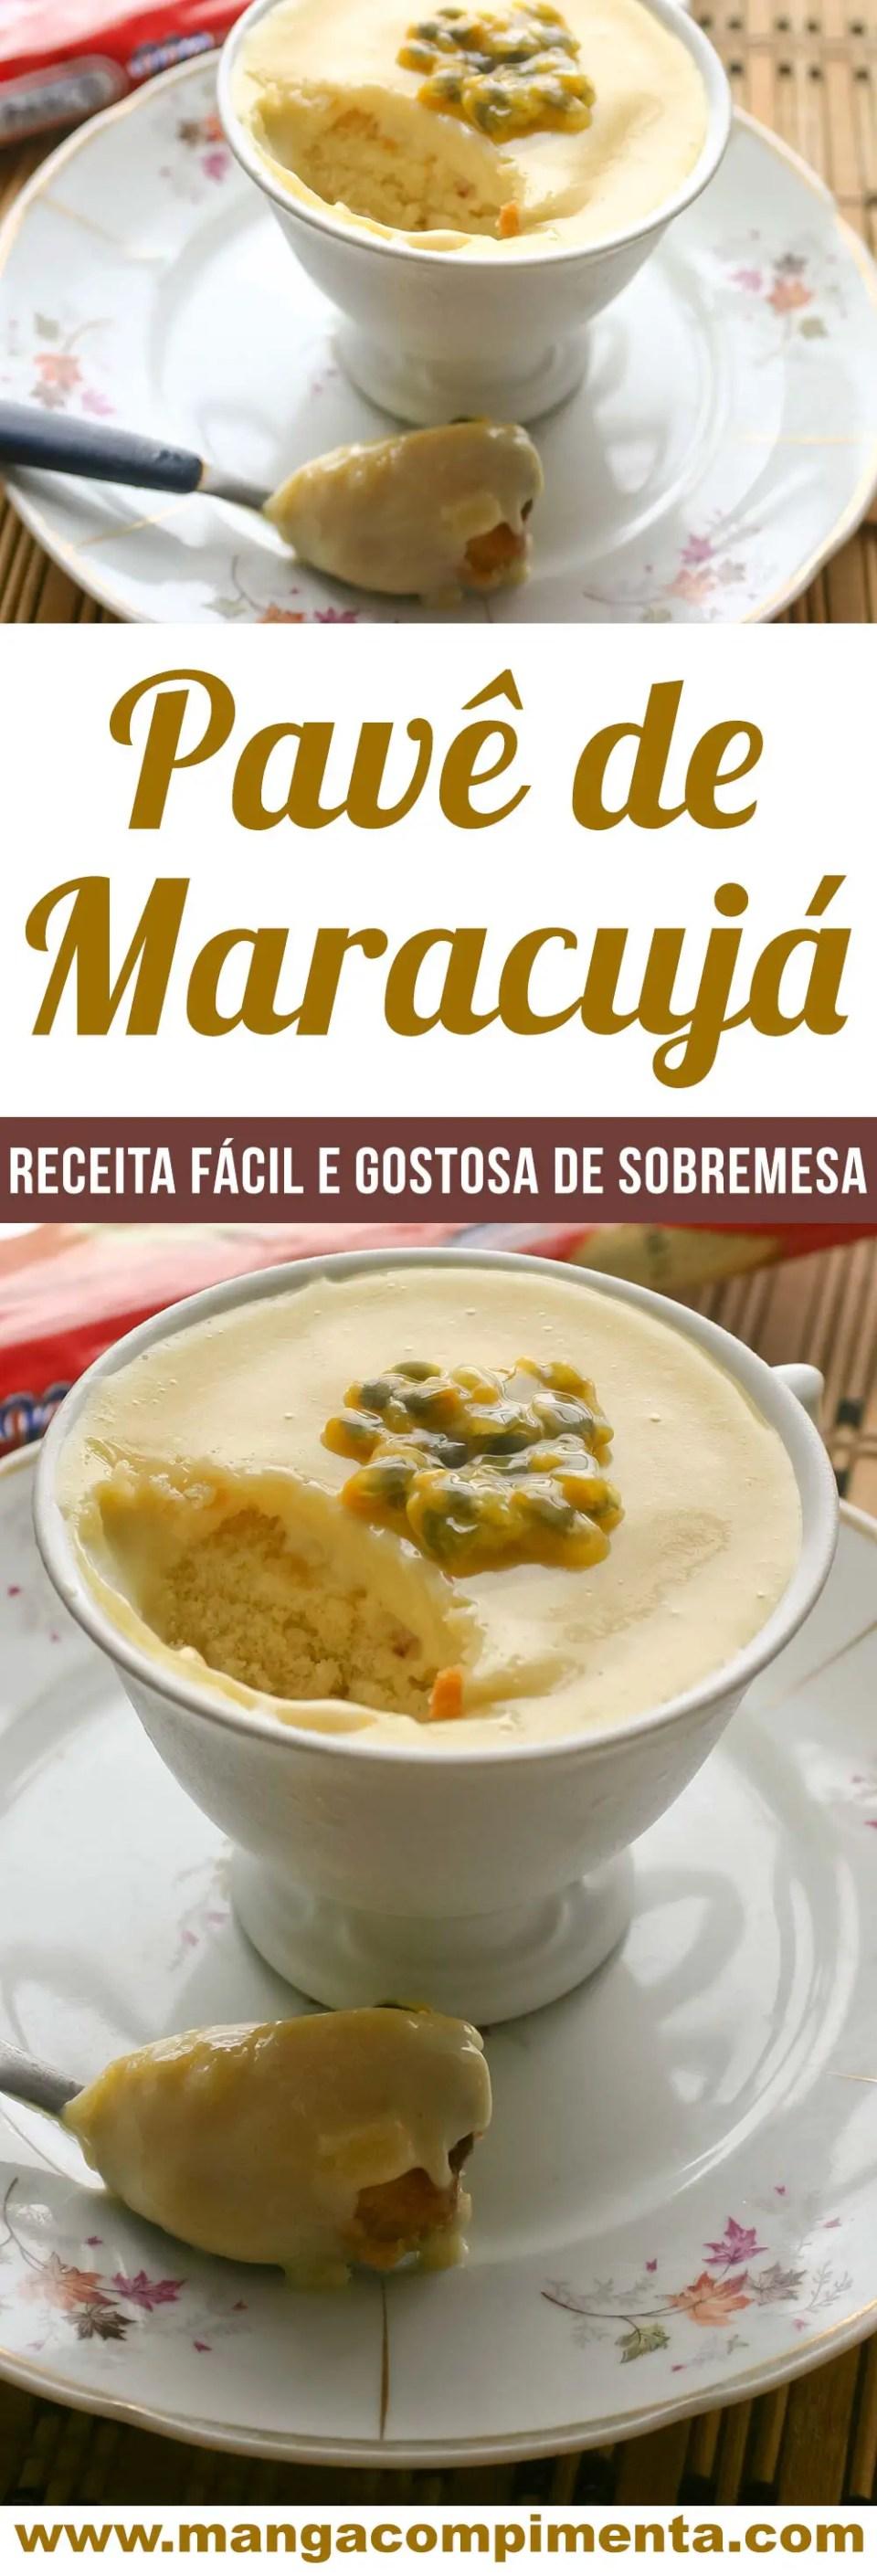 Pavê de Maracujá na Xícara de Chá | Prepare essa sobremesa para toda família!